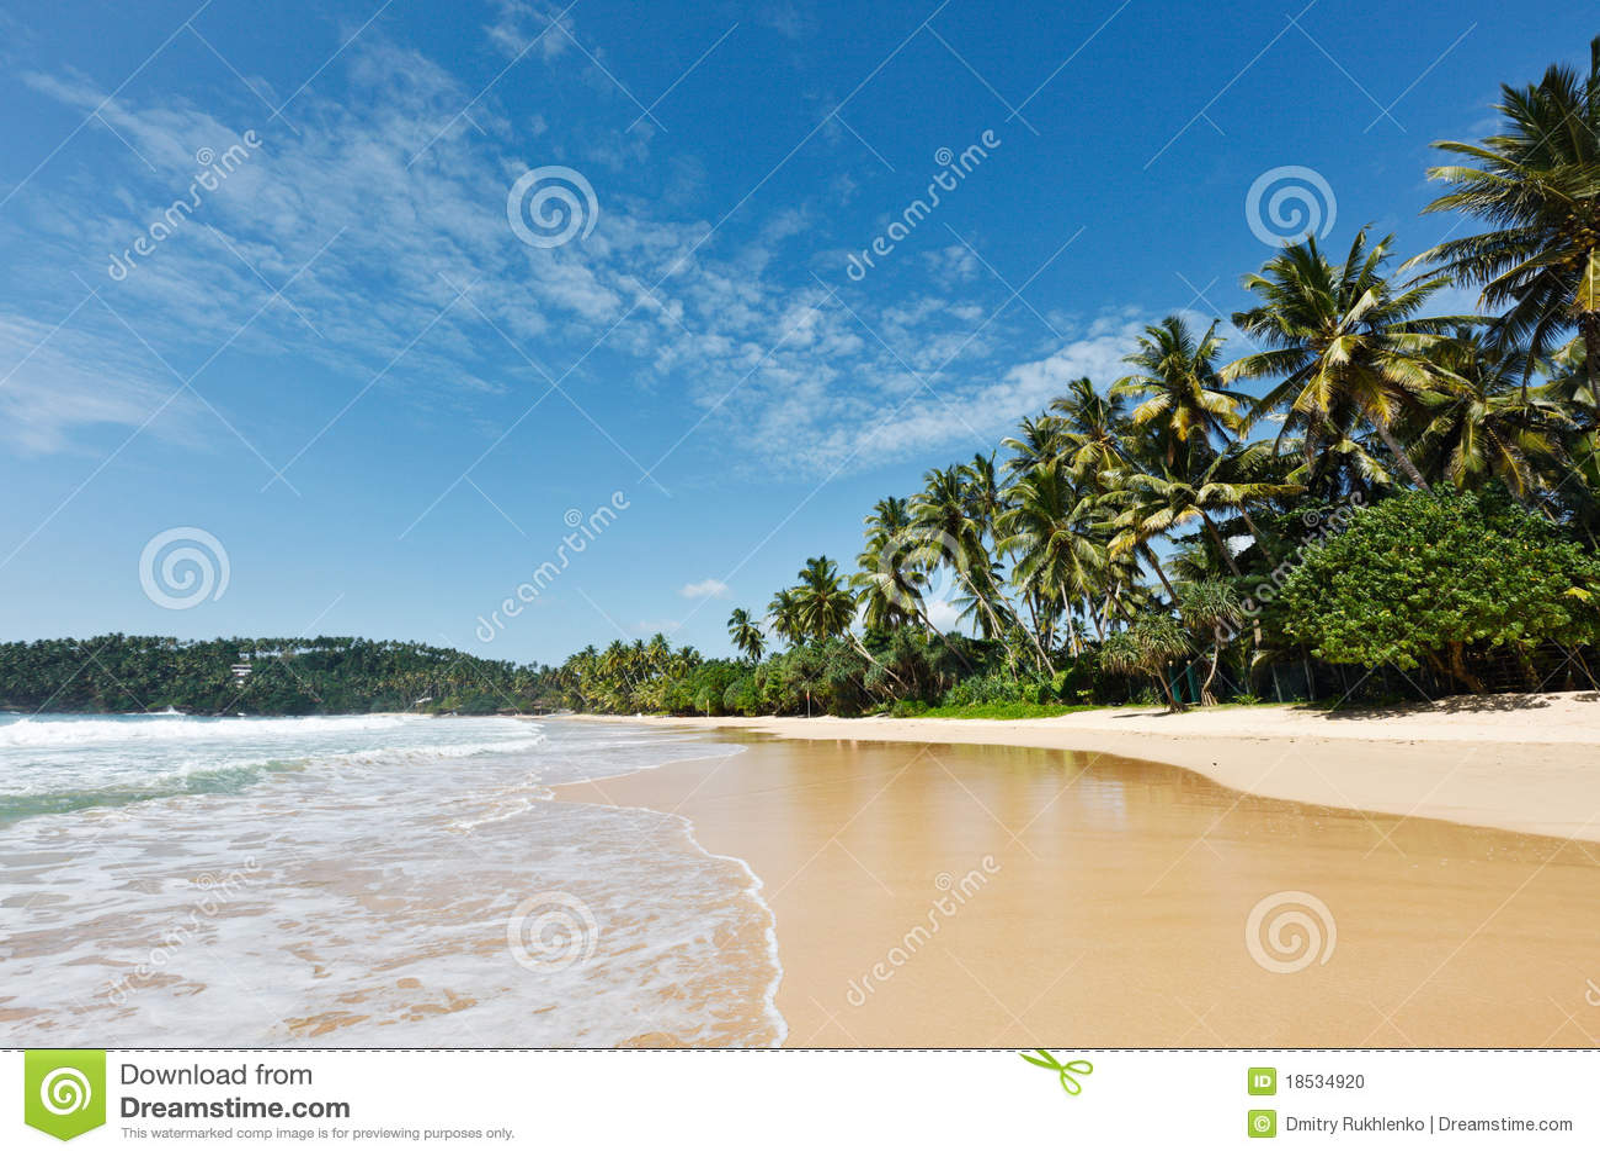 Plage idyllique. Le Sri Lanka